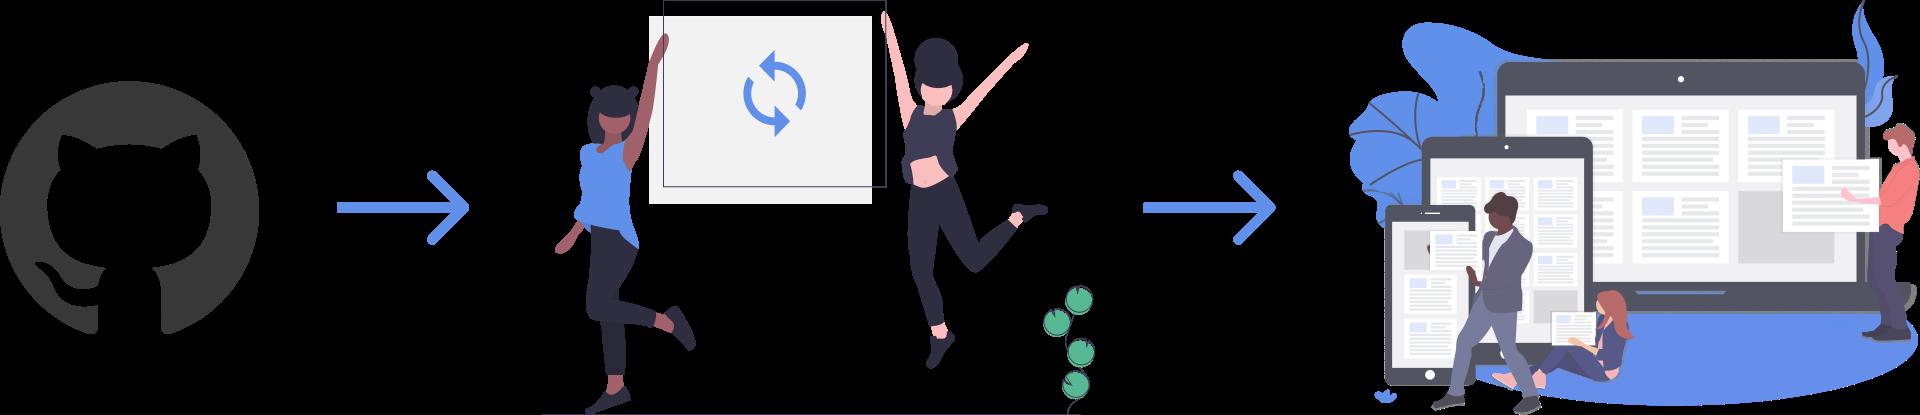 Sync Diagram